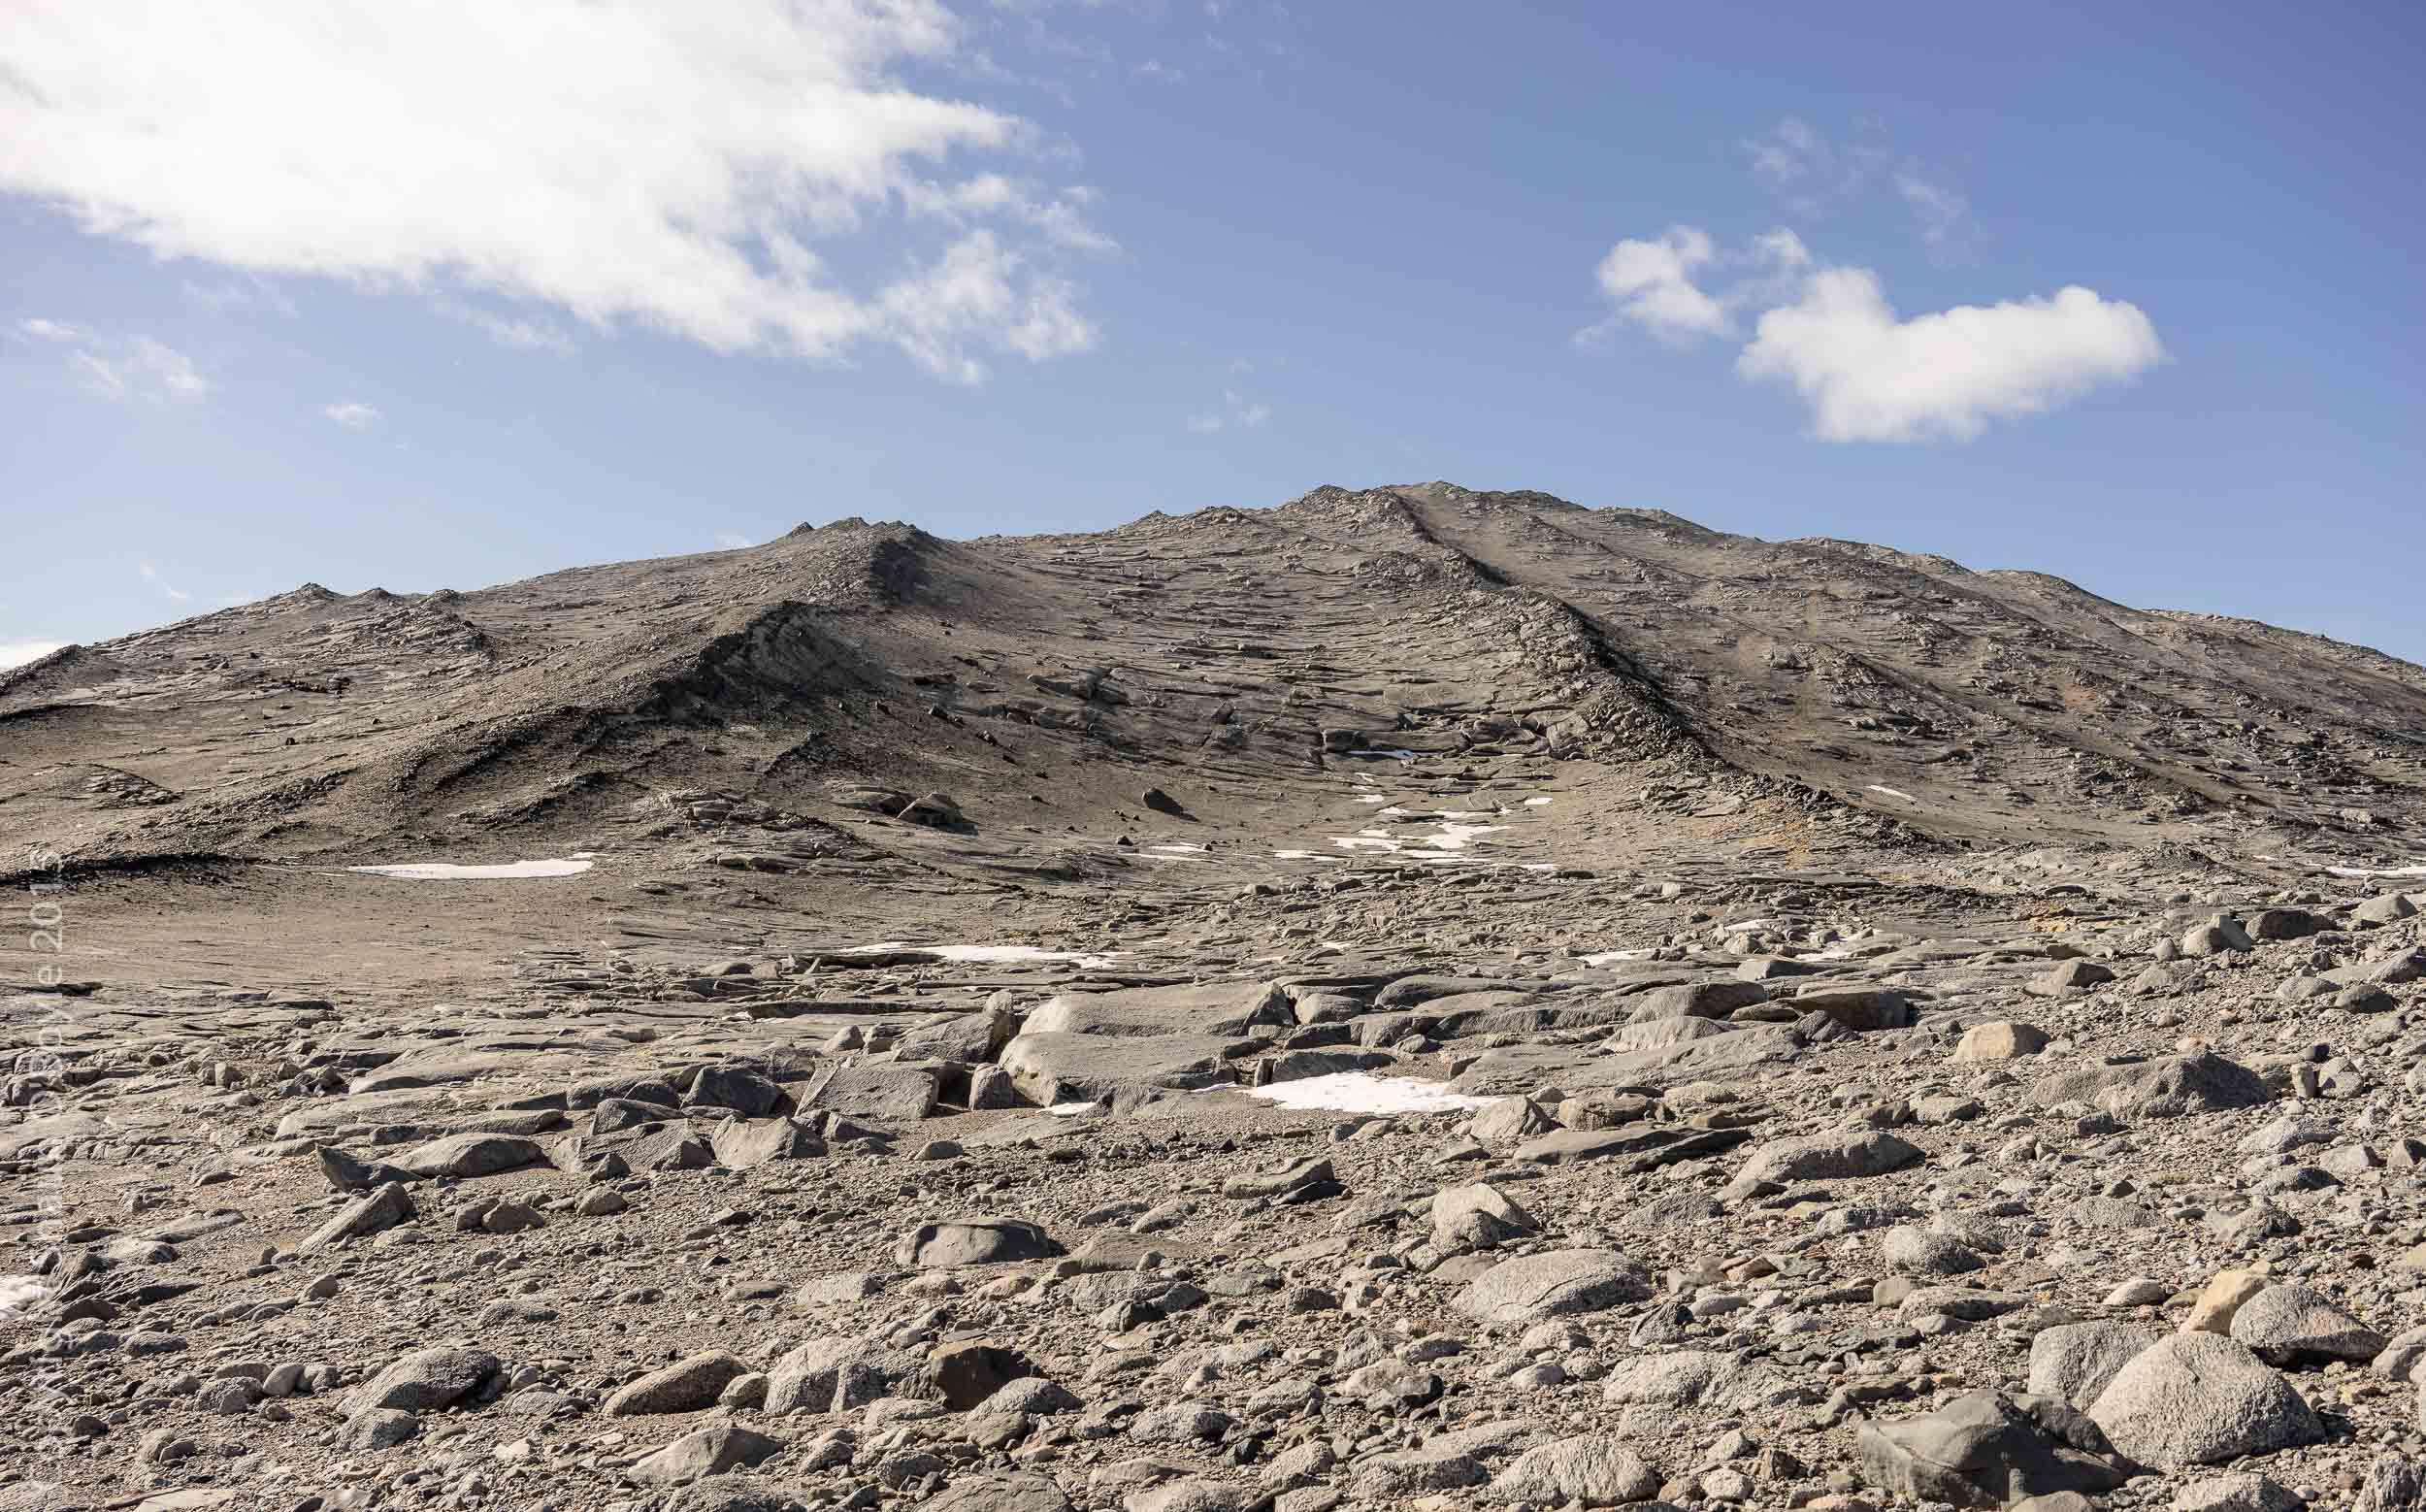 Climbing Nussbaum Riegel